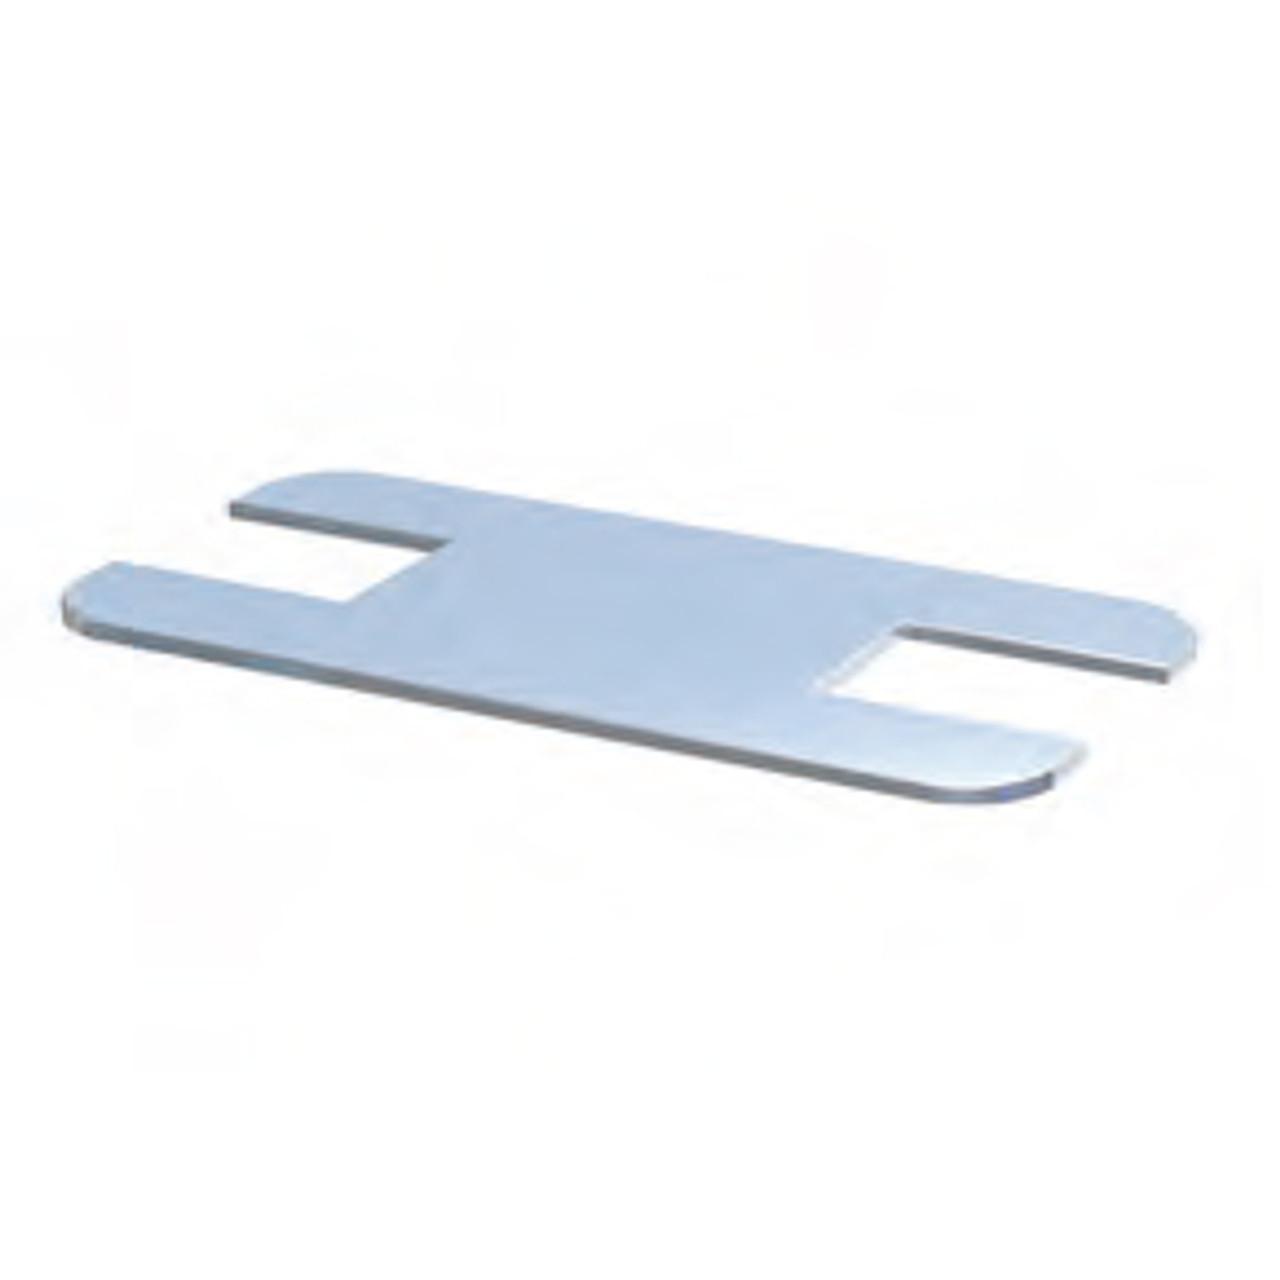 LP2316 Locking Plate